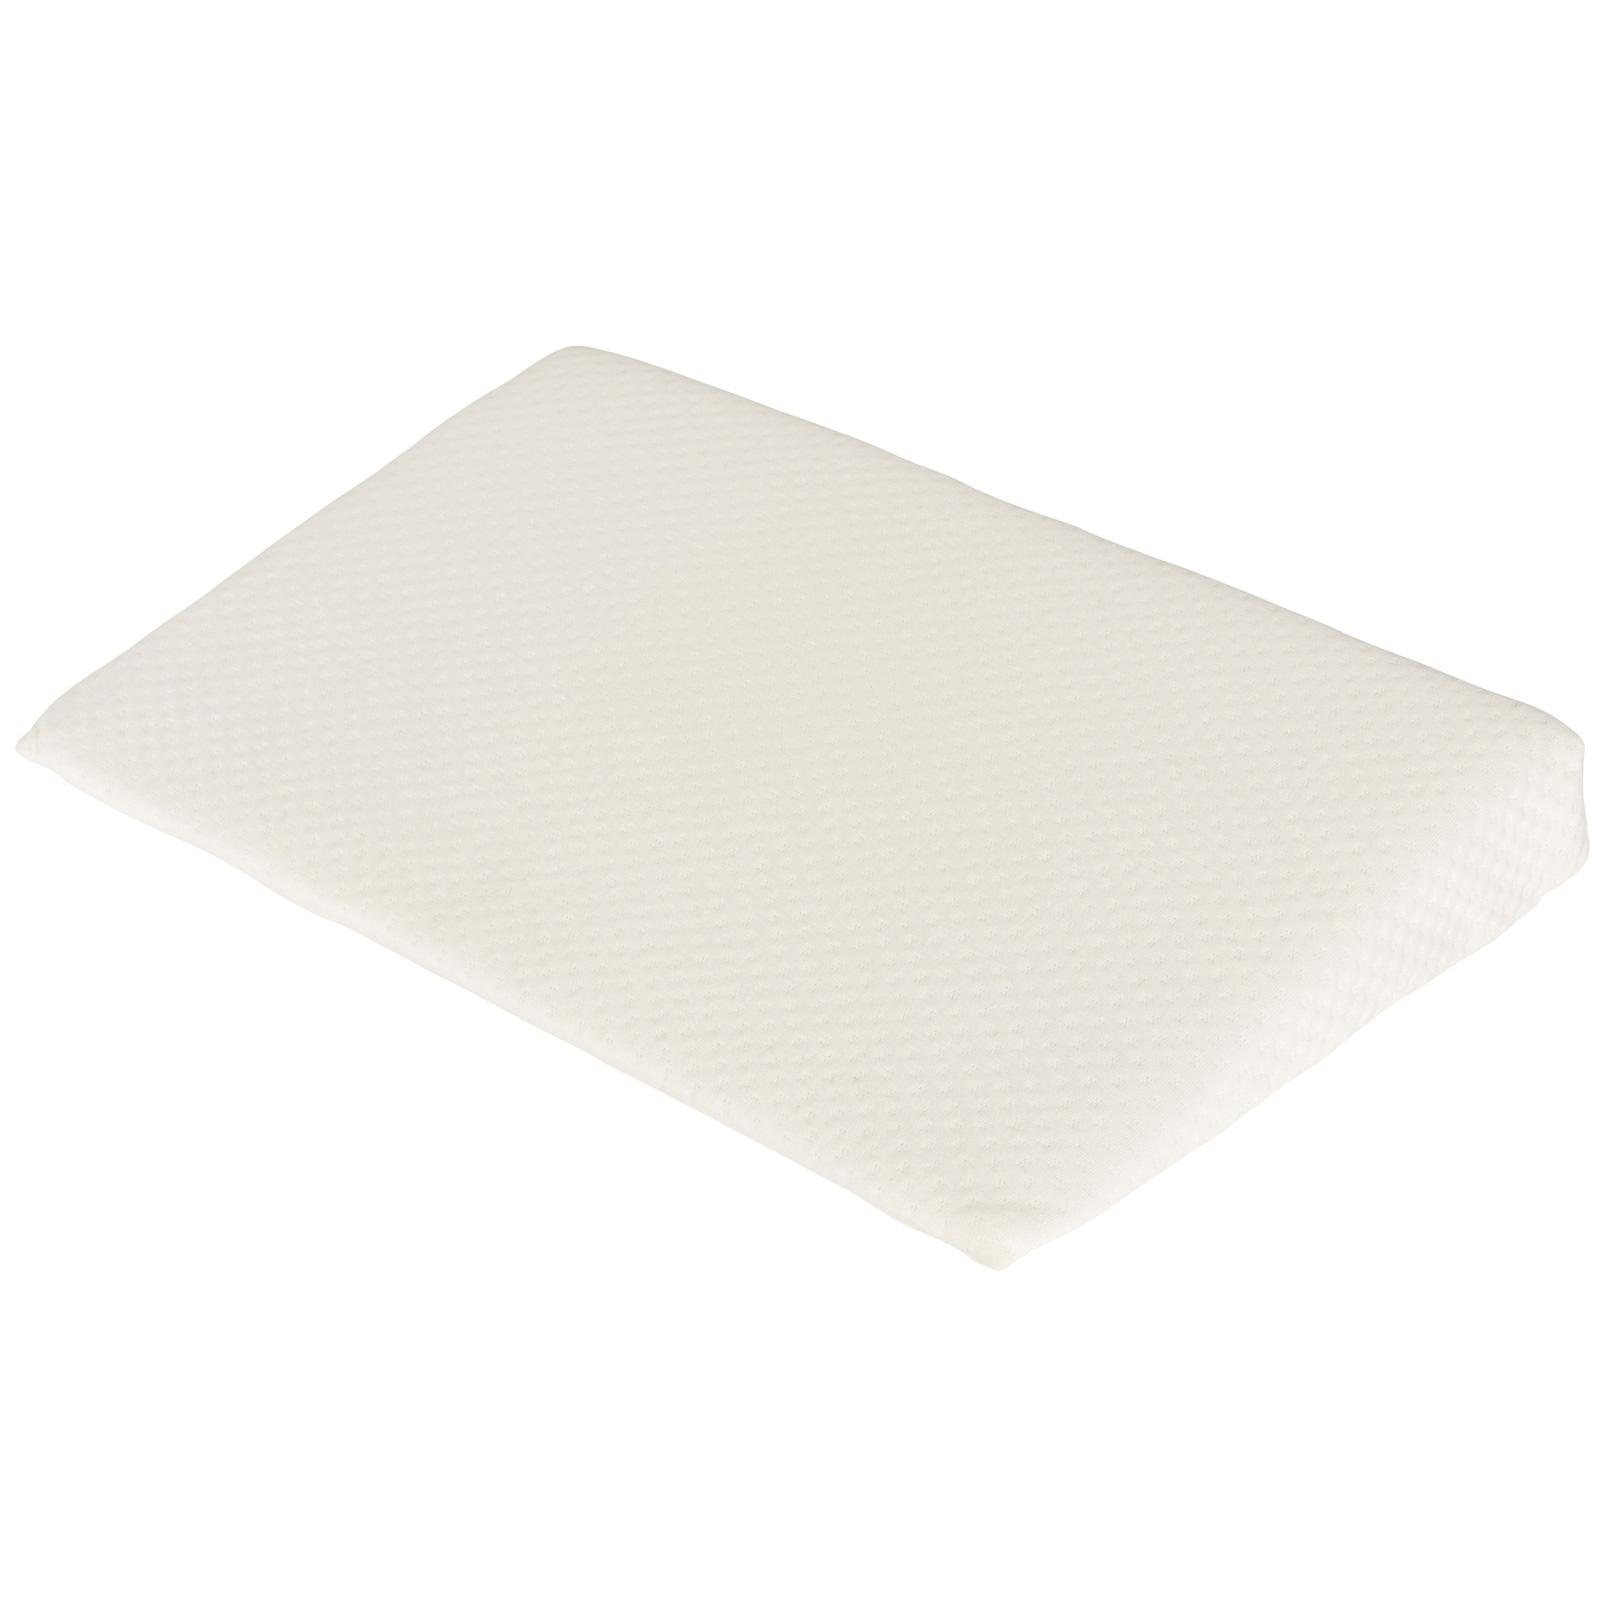 Candide Oreiller Plan Inclin/é 15/° Bamboo Soft Pour Lit 70x140 cm